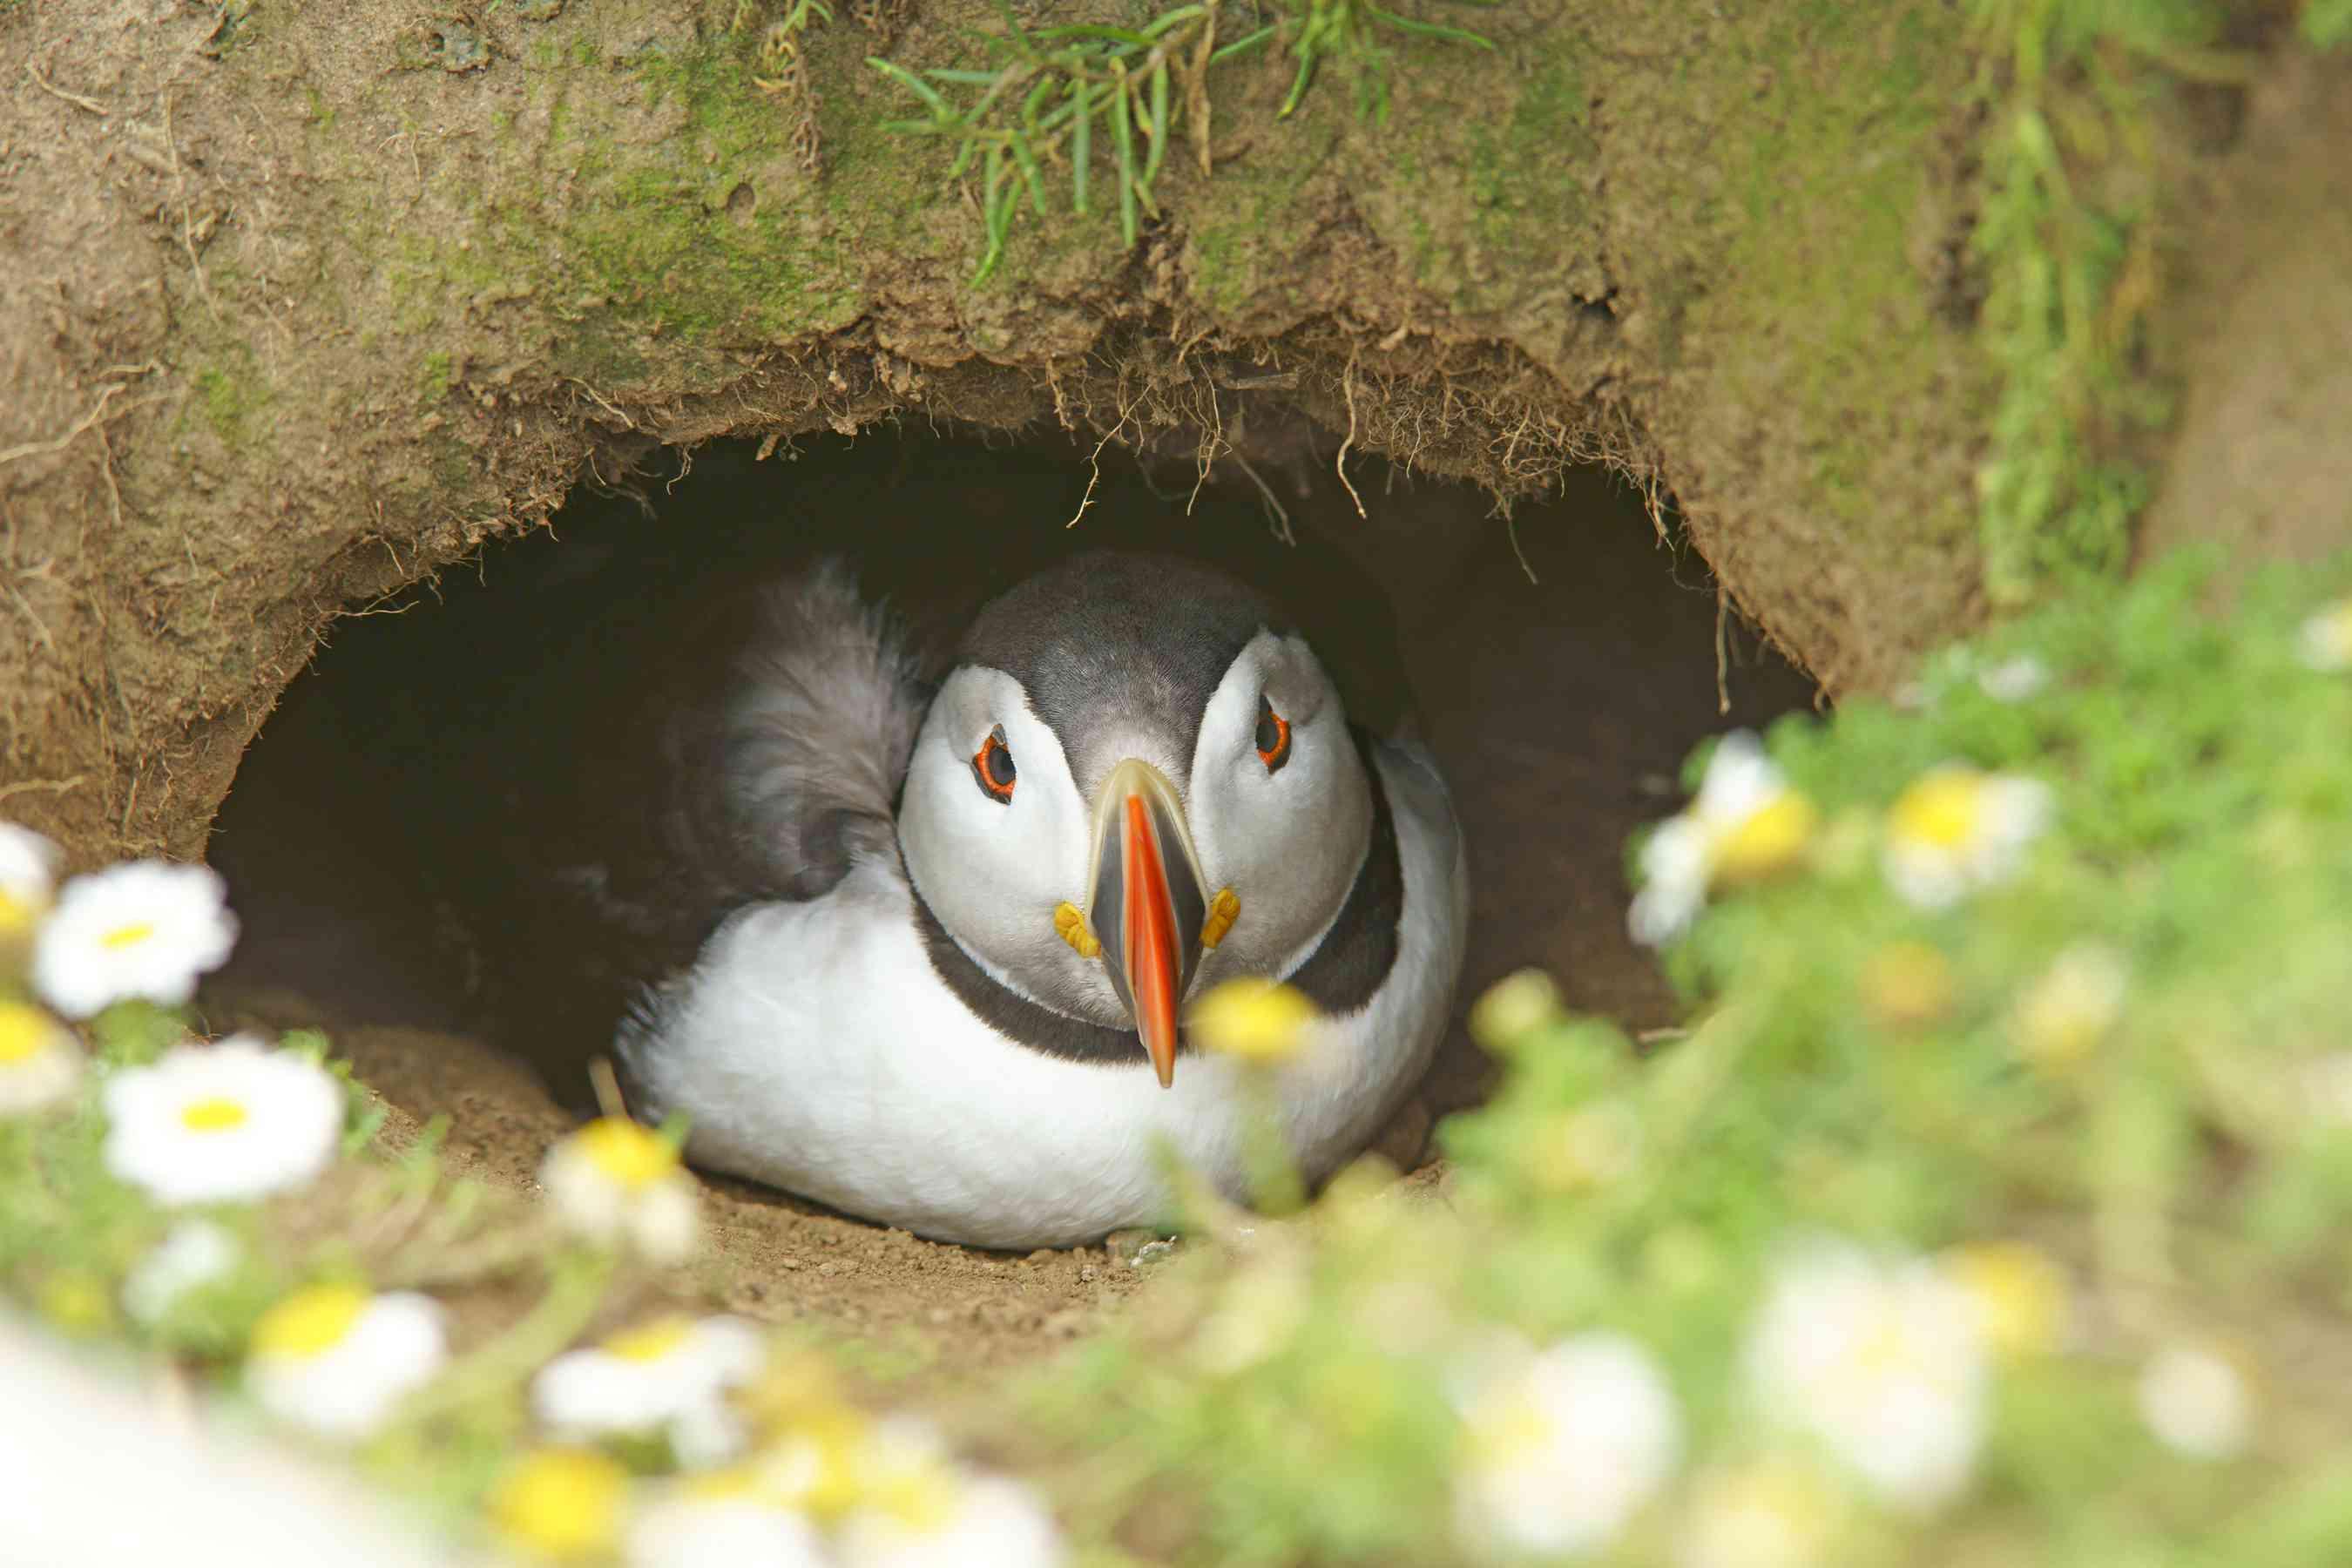 Atlantic Puffin in nesting burrow, Skomer Island Wales UK